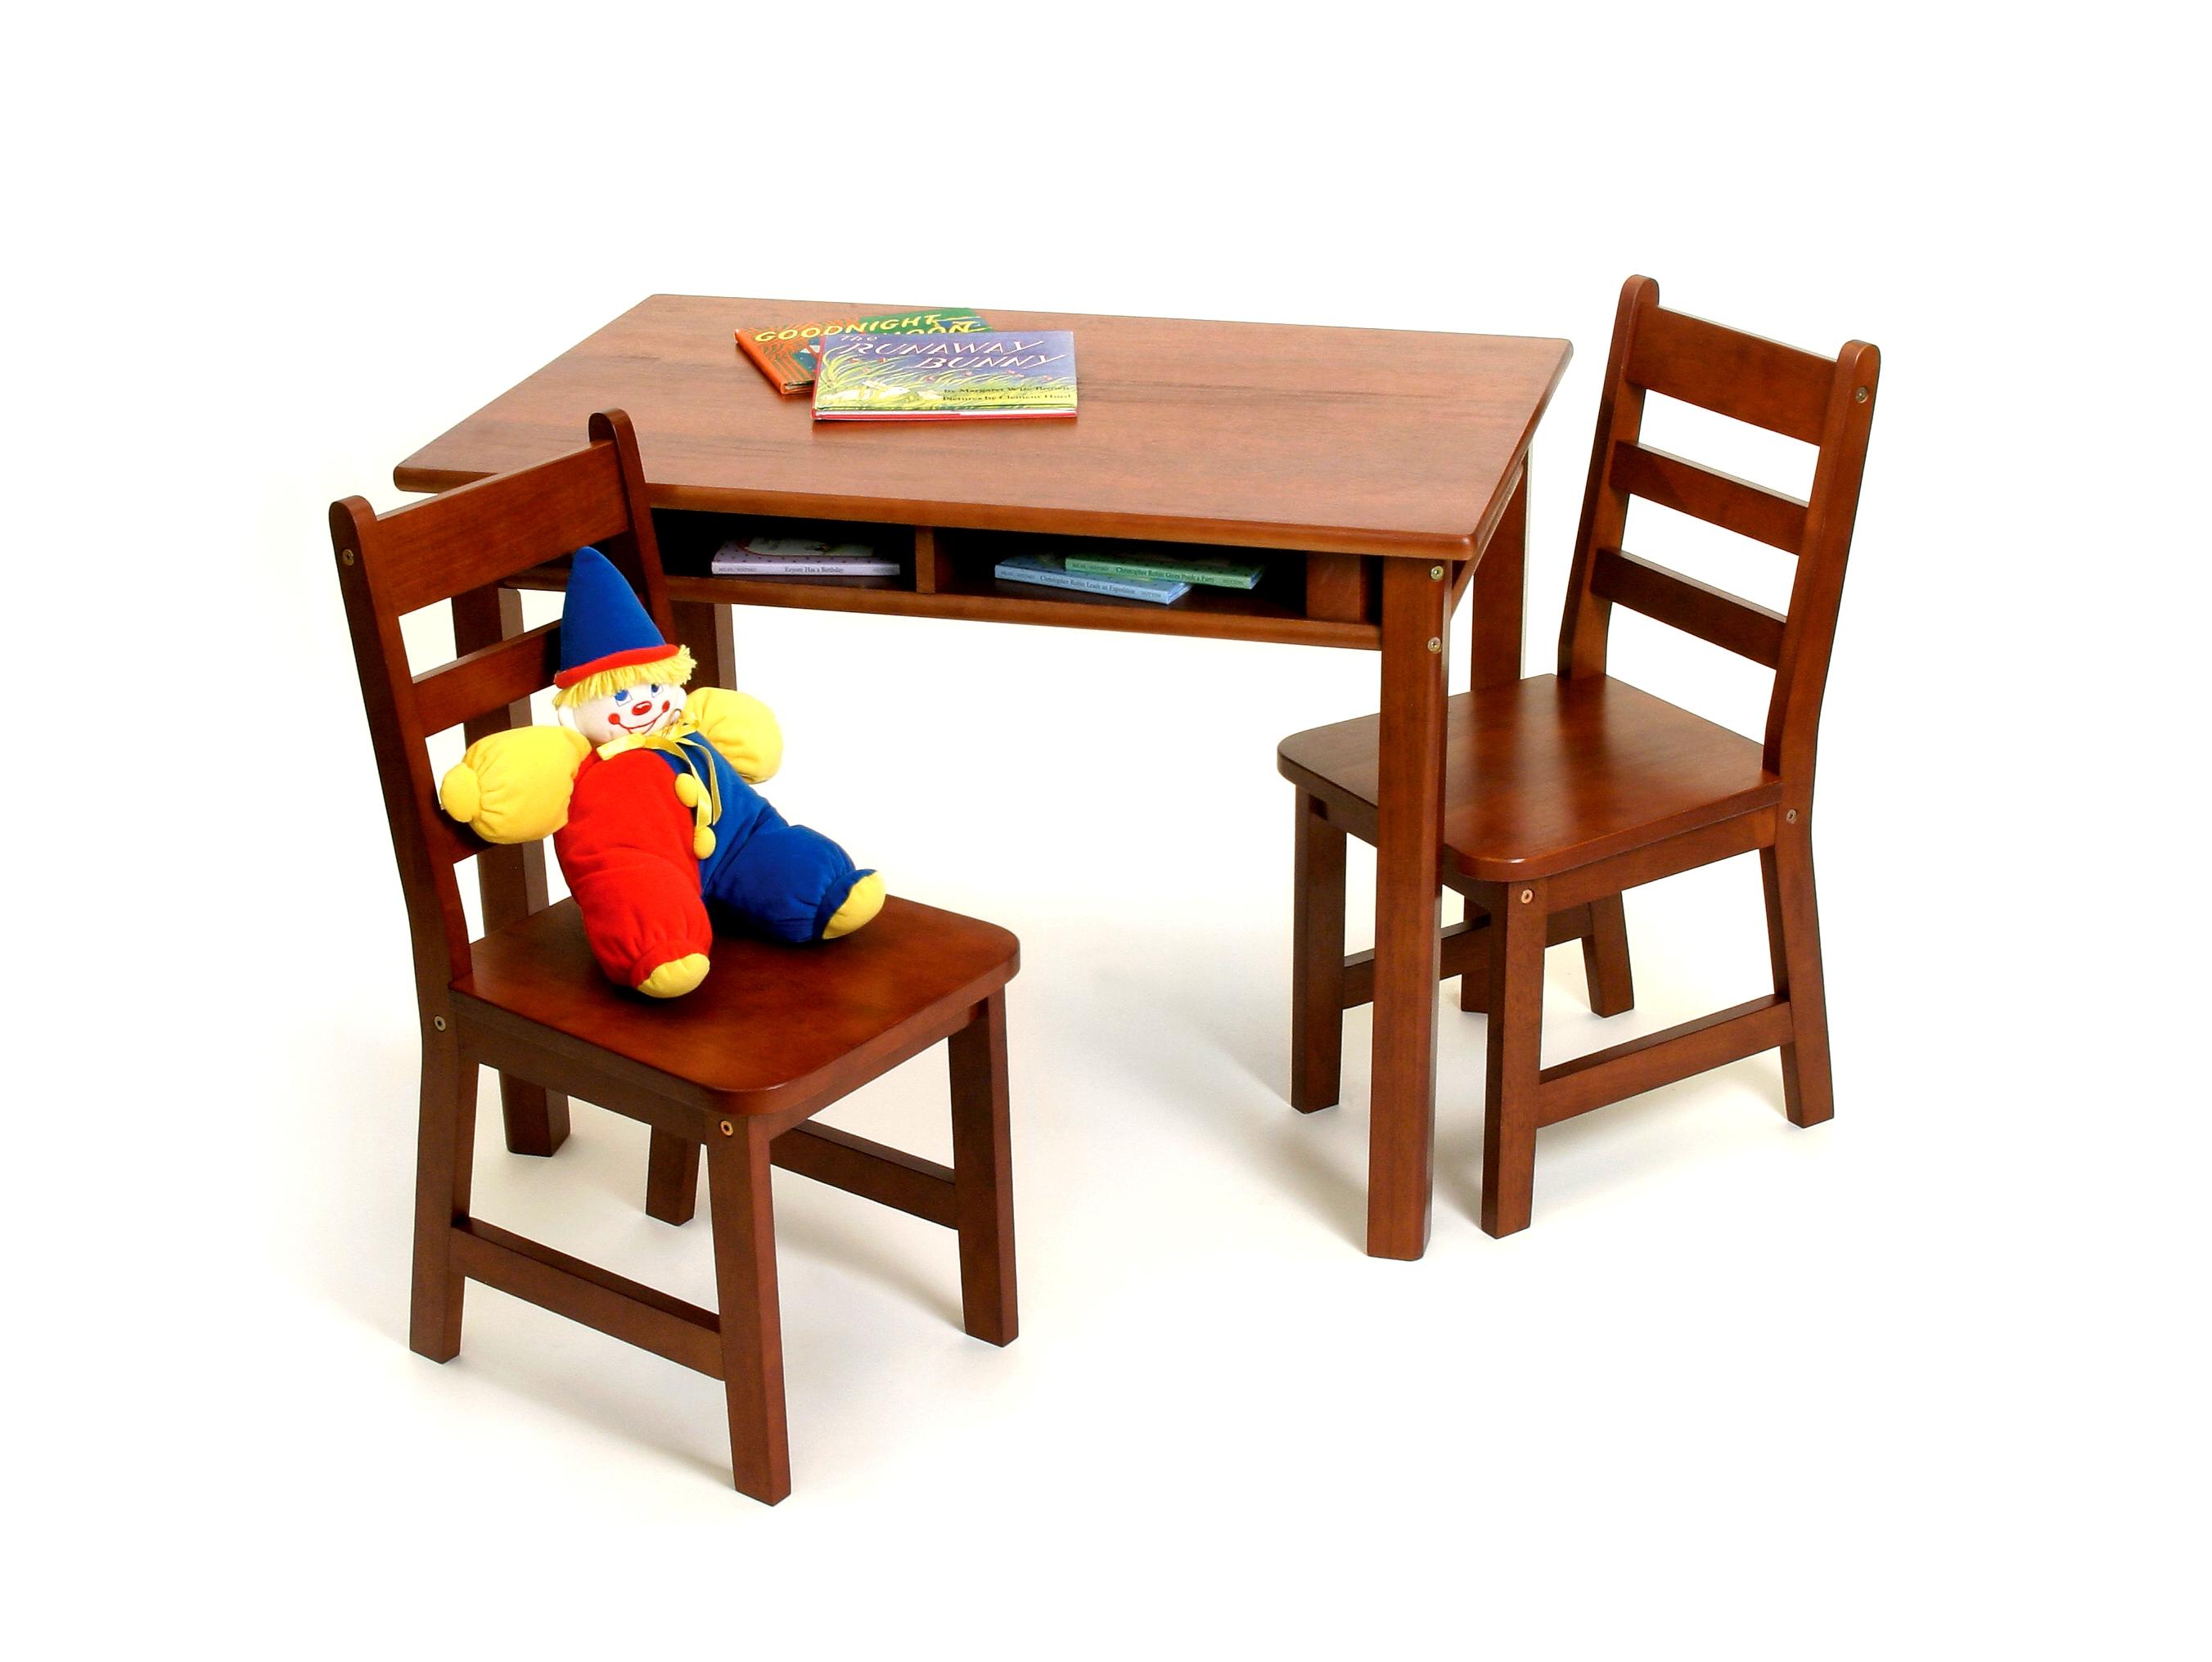 Childu0027s Rectangular Table with Shelves u0026 2 Chairs Cherry Finish | Lipper International Table u0026 Chair Sets  sc 1 st  Lipper International & Childu0027s Rectangular Table with Shelves u0026 2 Chairs Cherry Finish ...